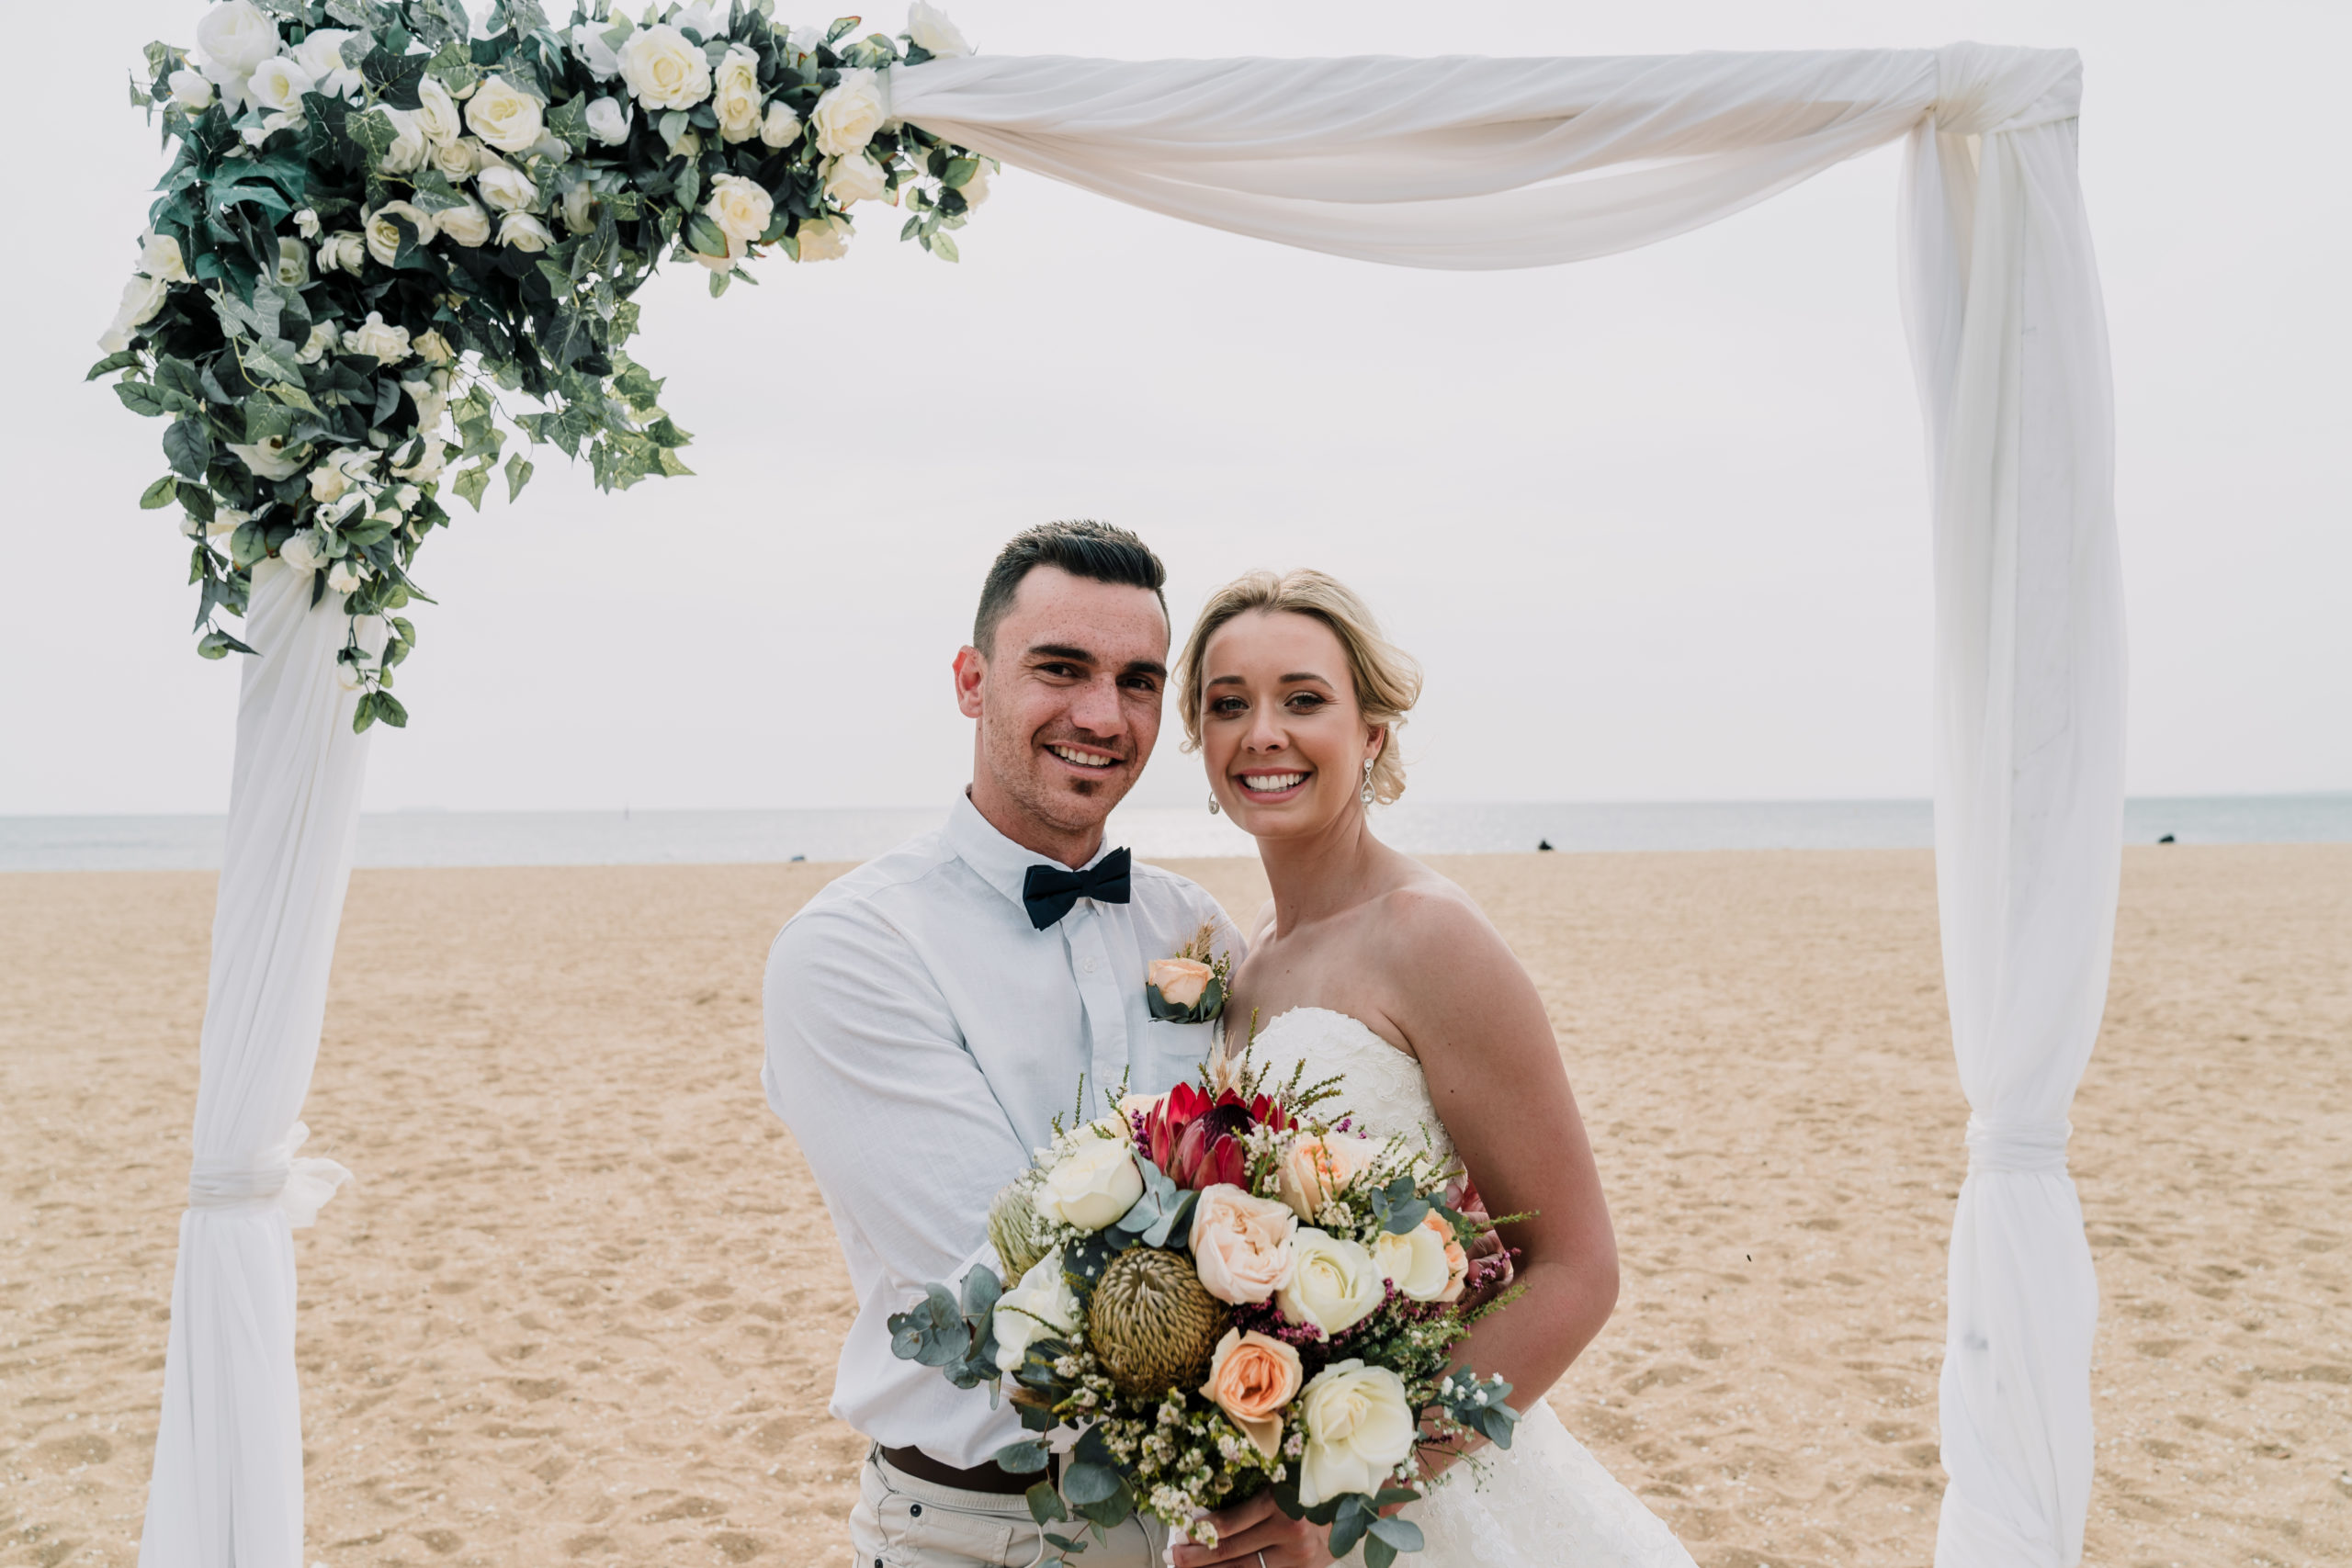 couple at beach wedding